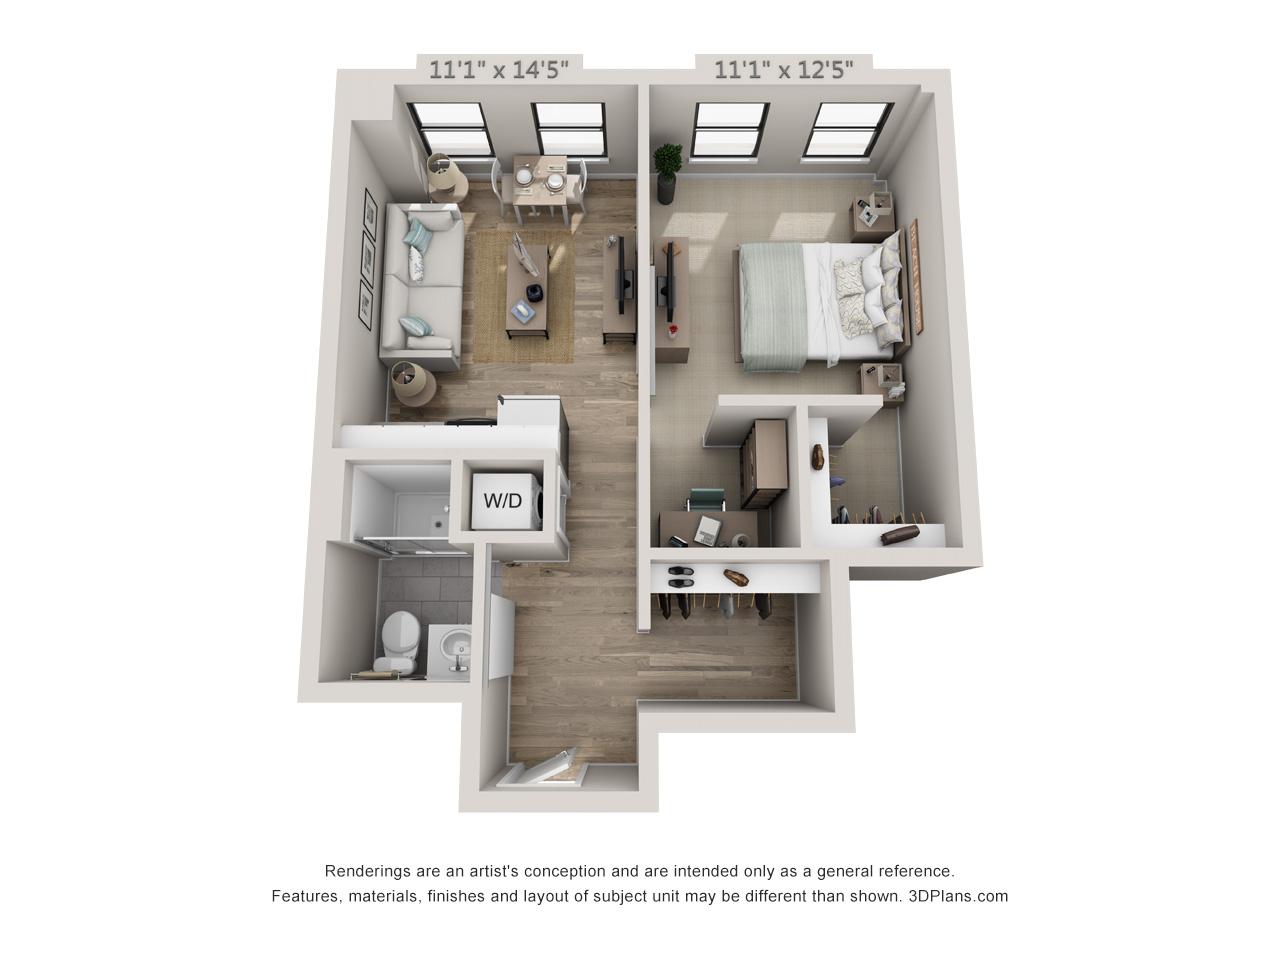 1 Bedroom Grand - 620 sq. feet